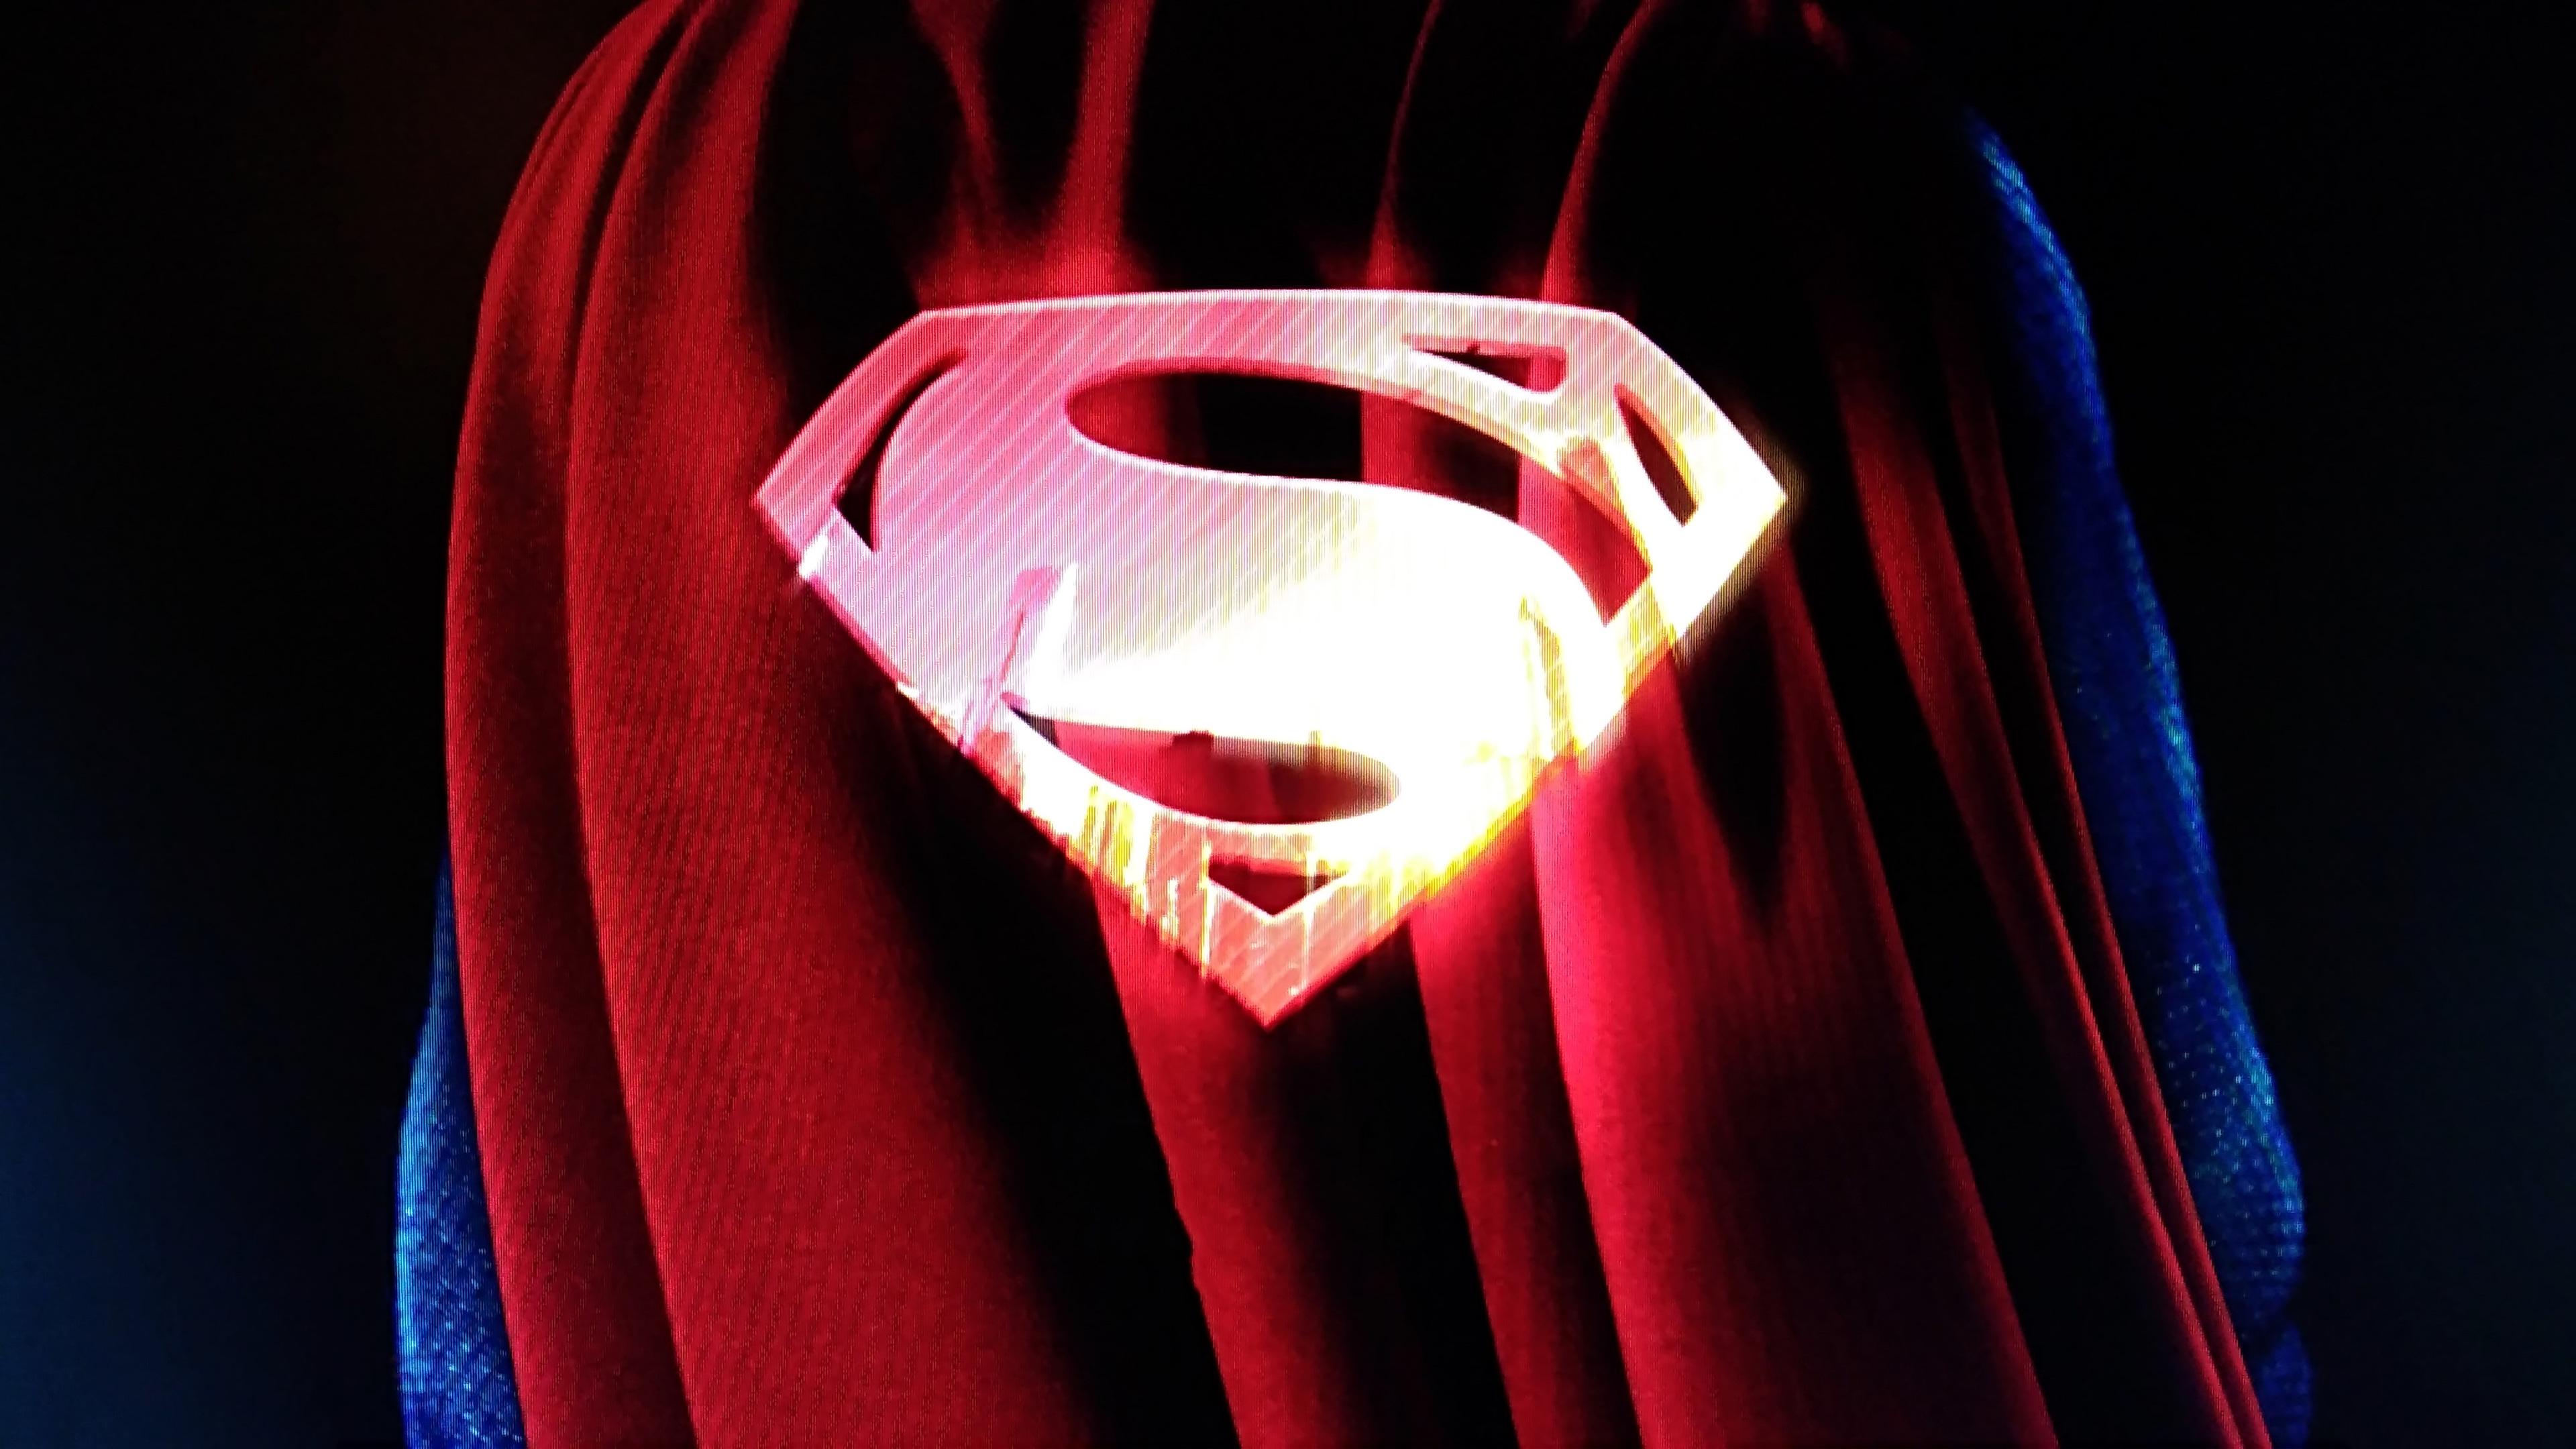 superman cape logo 1536522667 - Superman Cape Logo - superman wallpapers, superheroes wallpapers, logo wallpapers, hd-wallpapers, 5k wallpapers, 4k-wallpapers